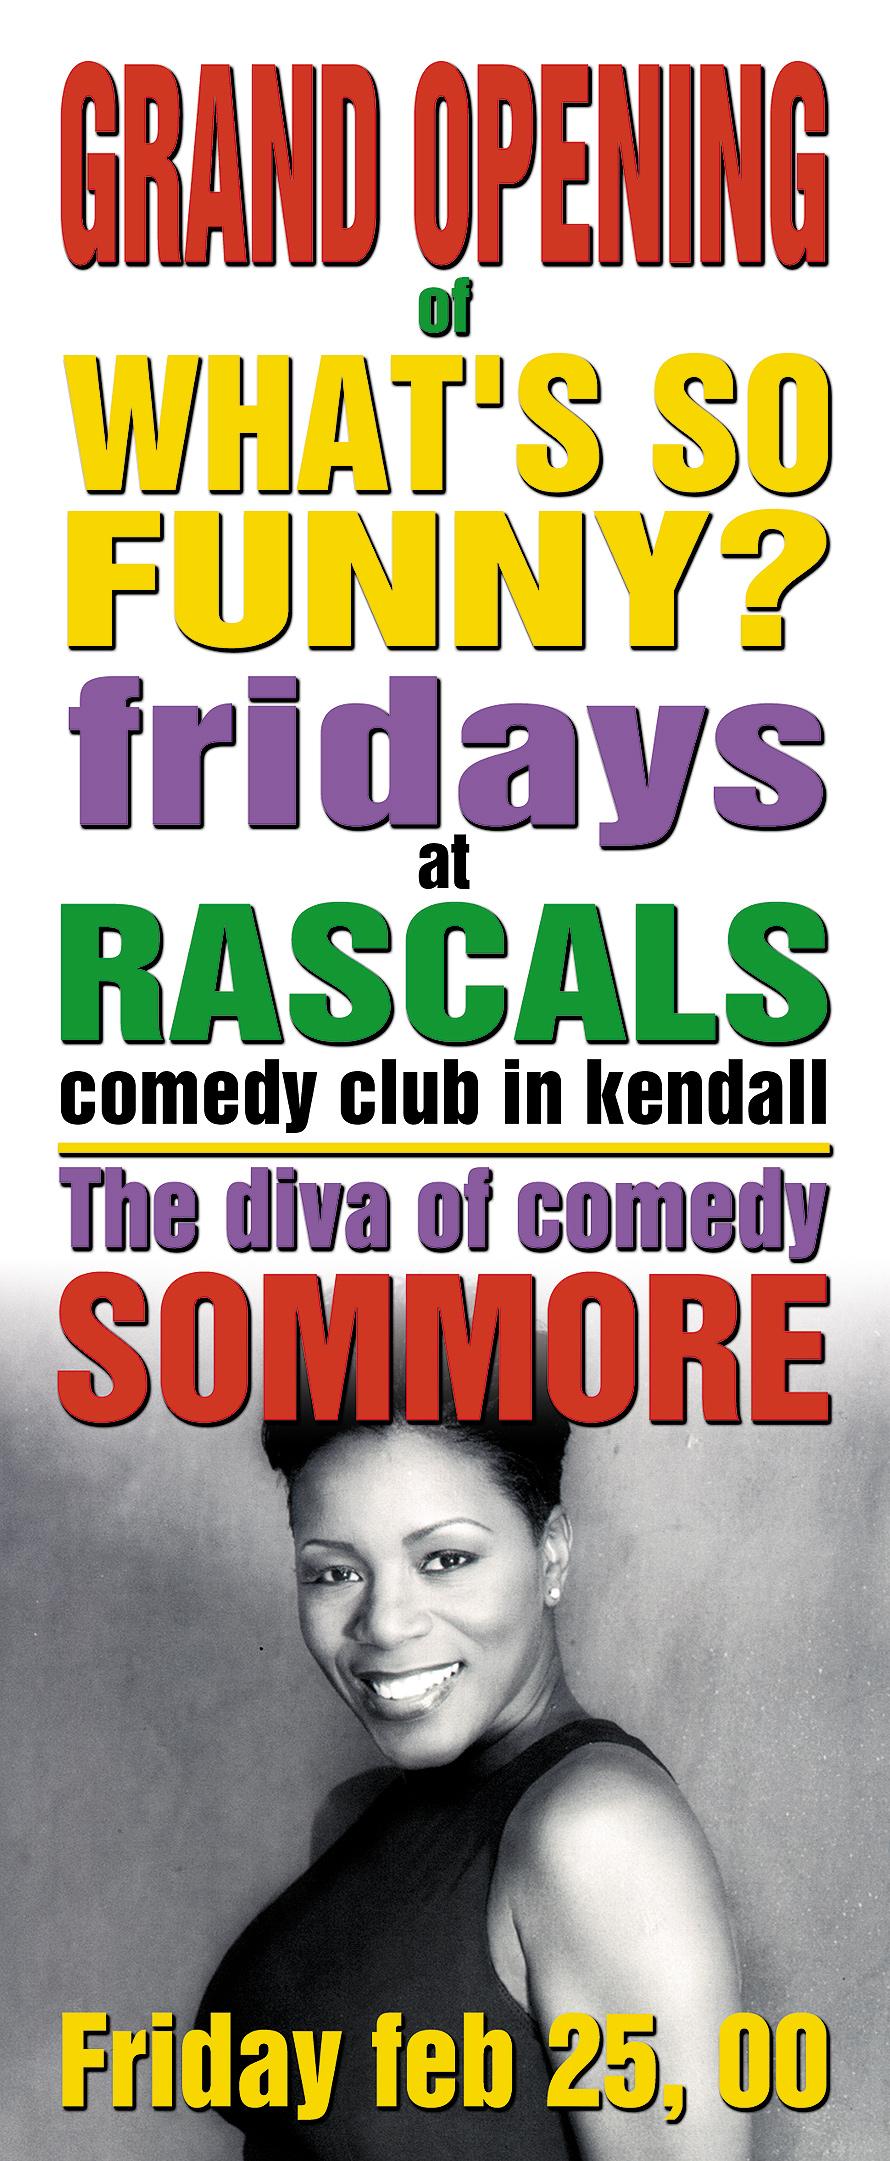 Rascals Comedy Club